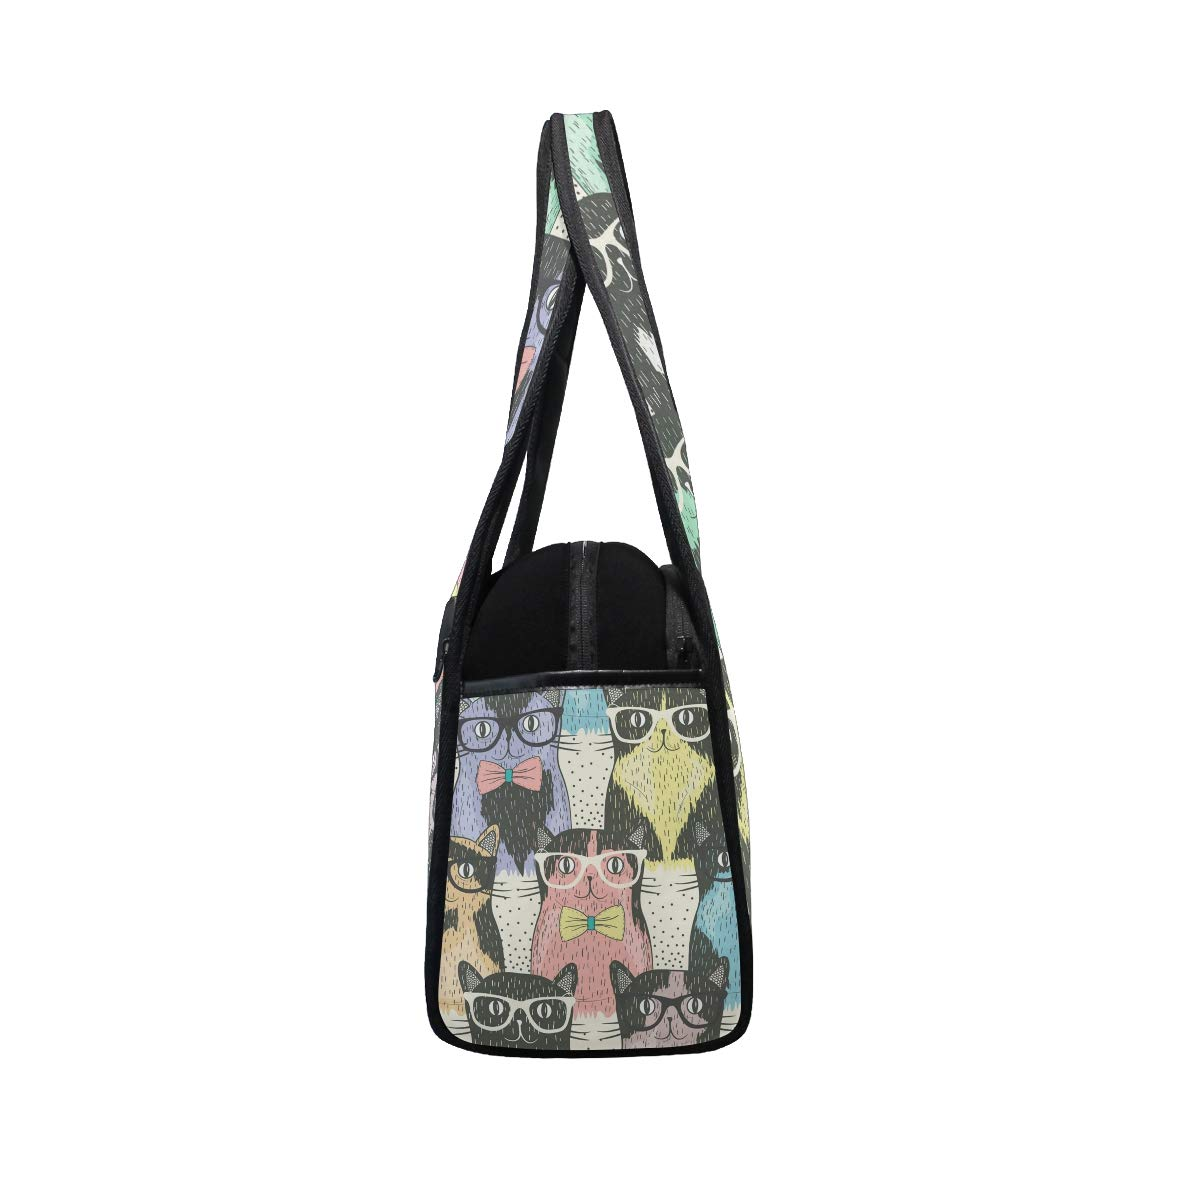 Art Cartoon Cool Cats Women Sports Gym Totes Bag Multi-Function Nylon Travel Shoulder Bag